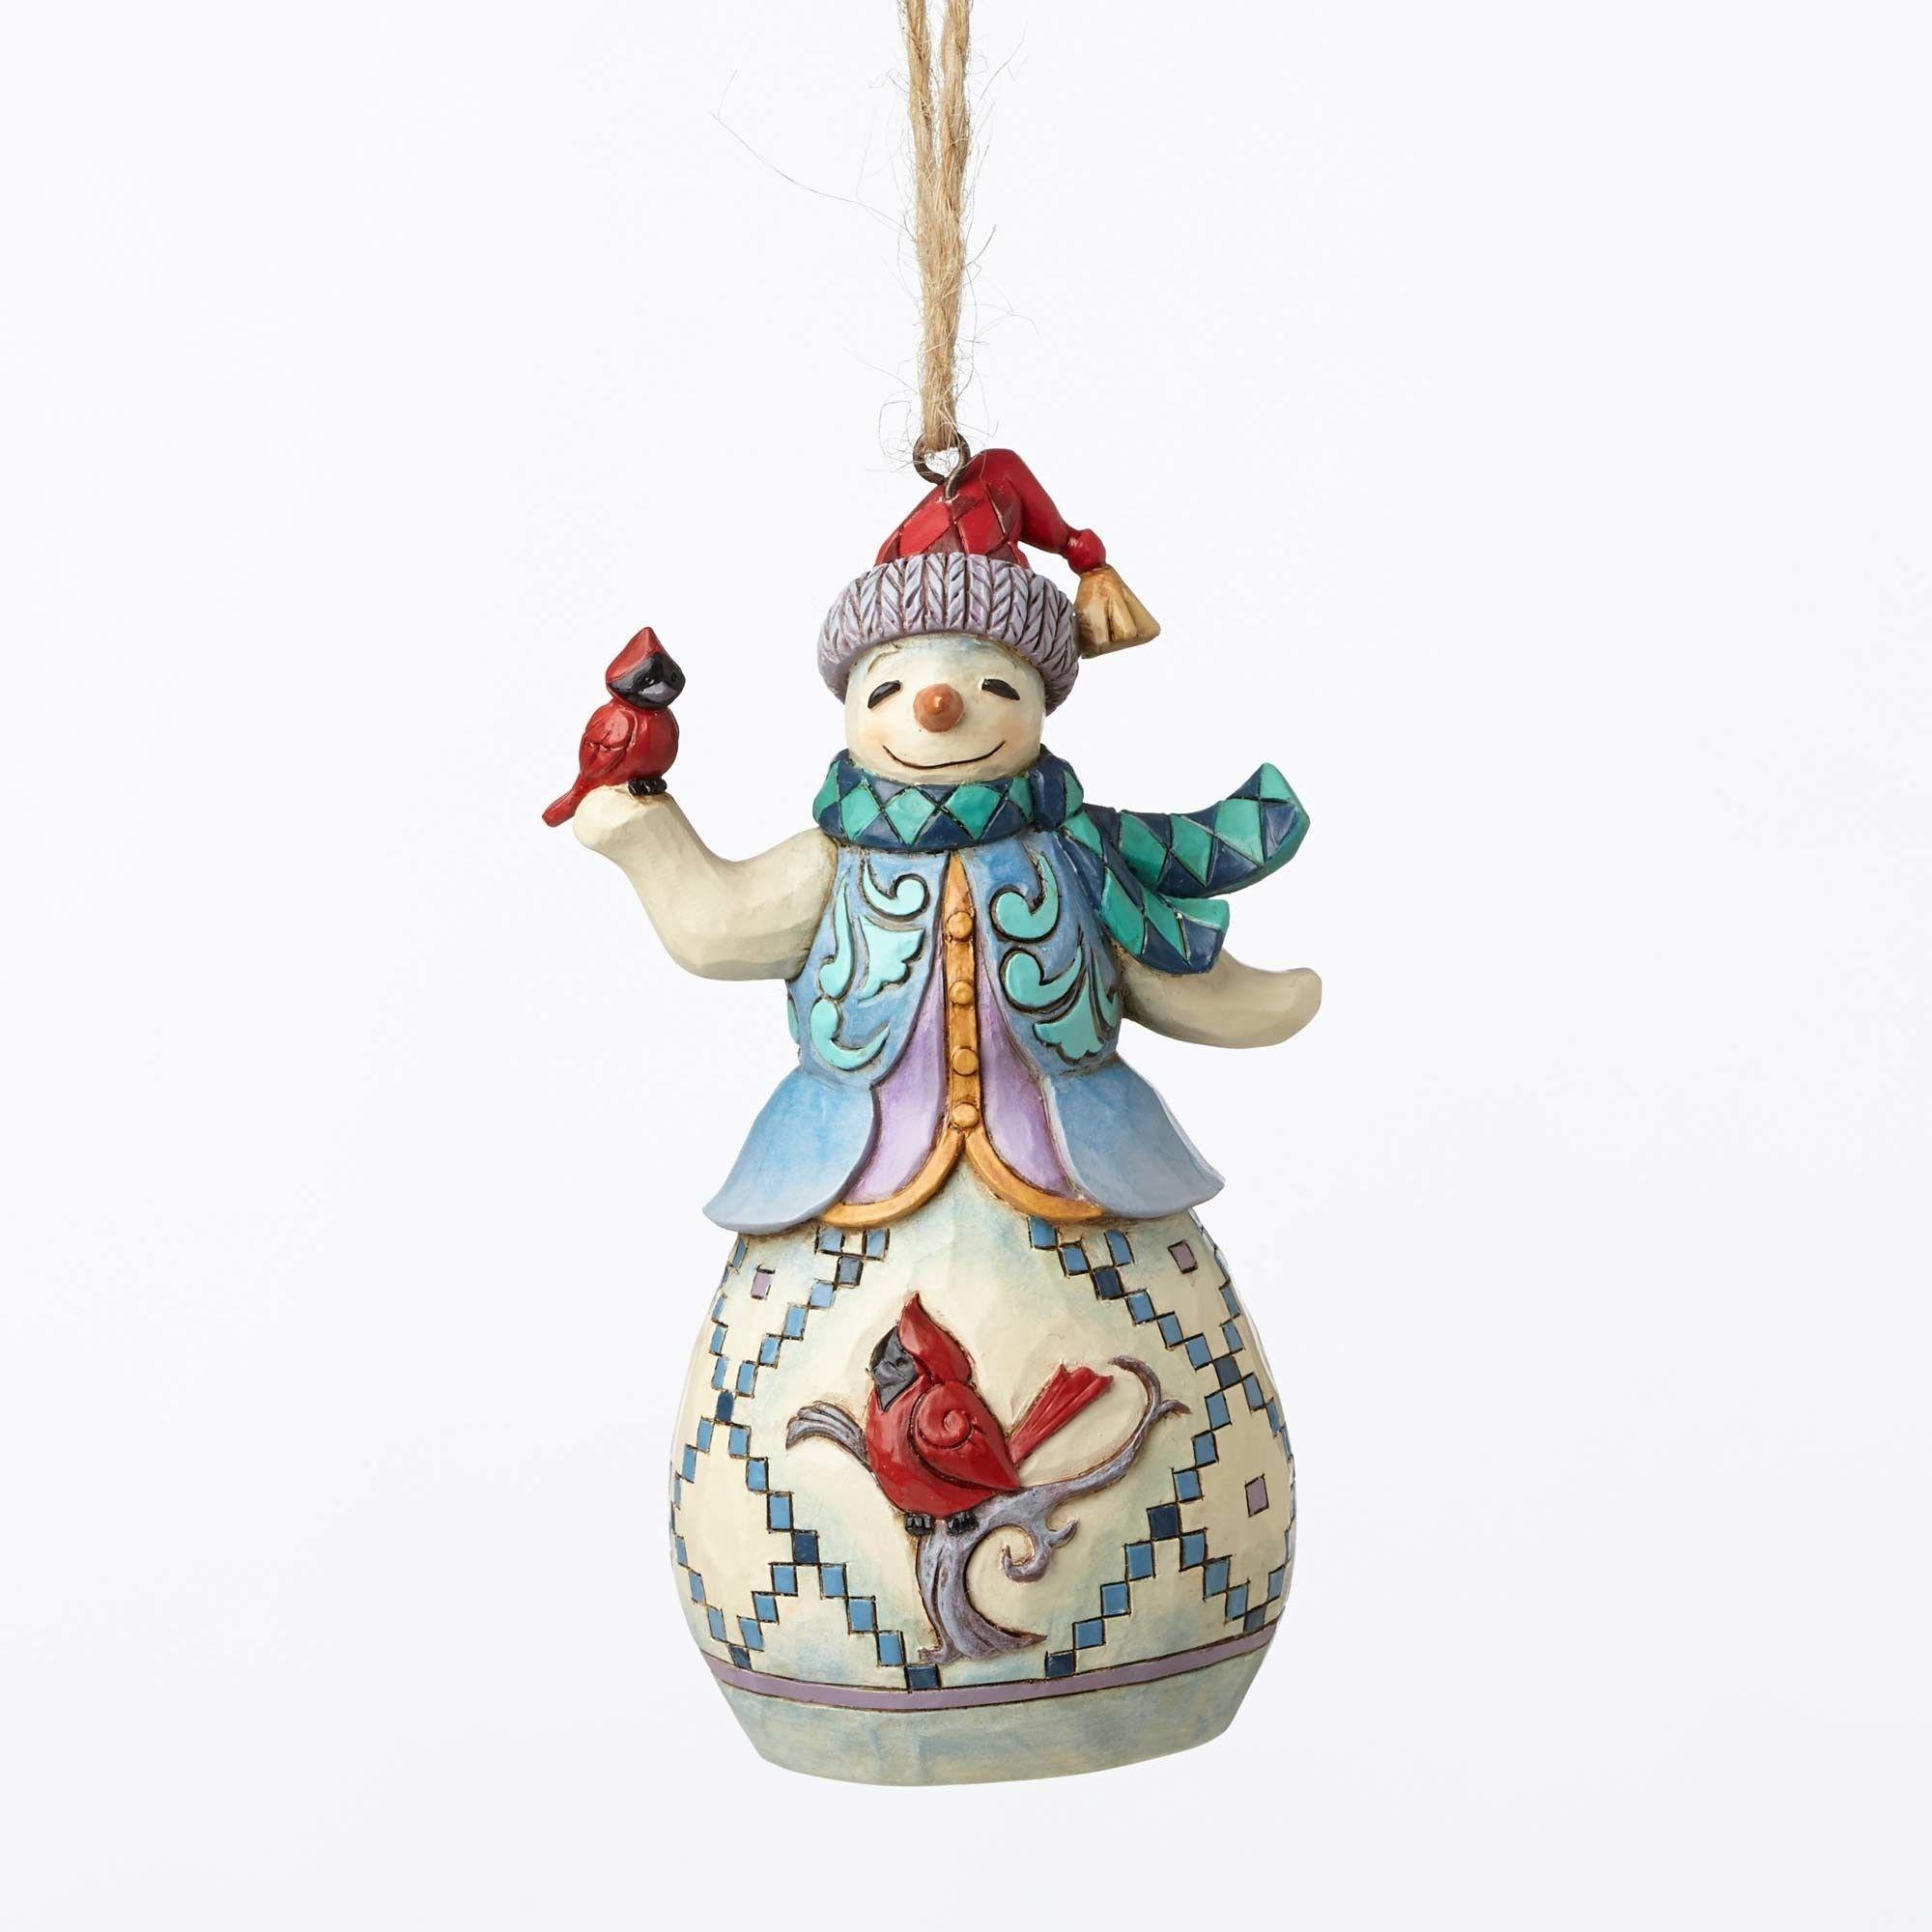 jim shore snowman with cardinal ornament